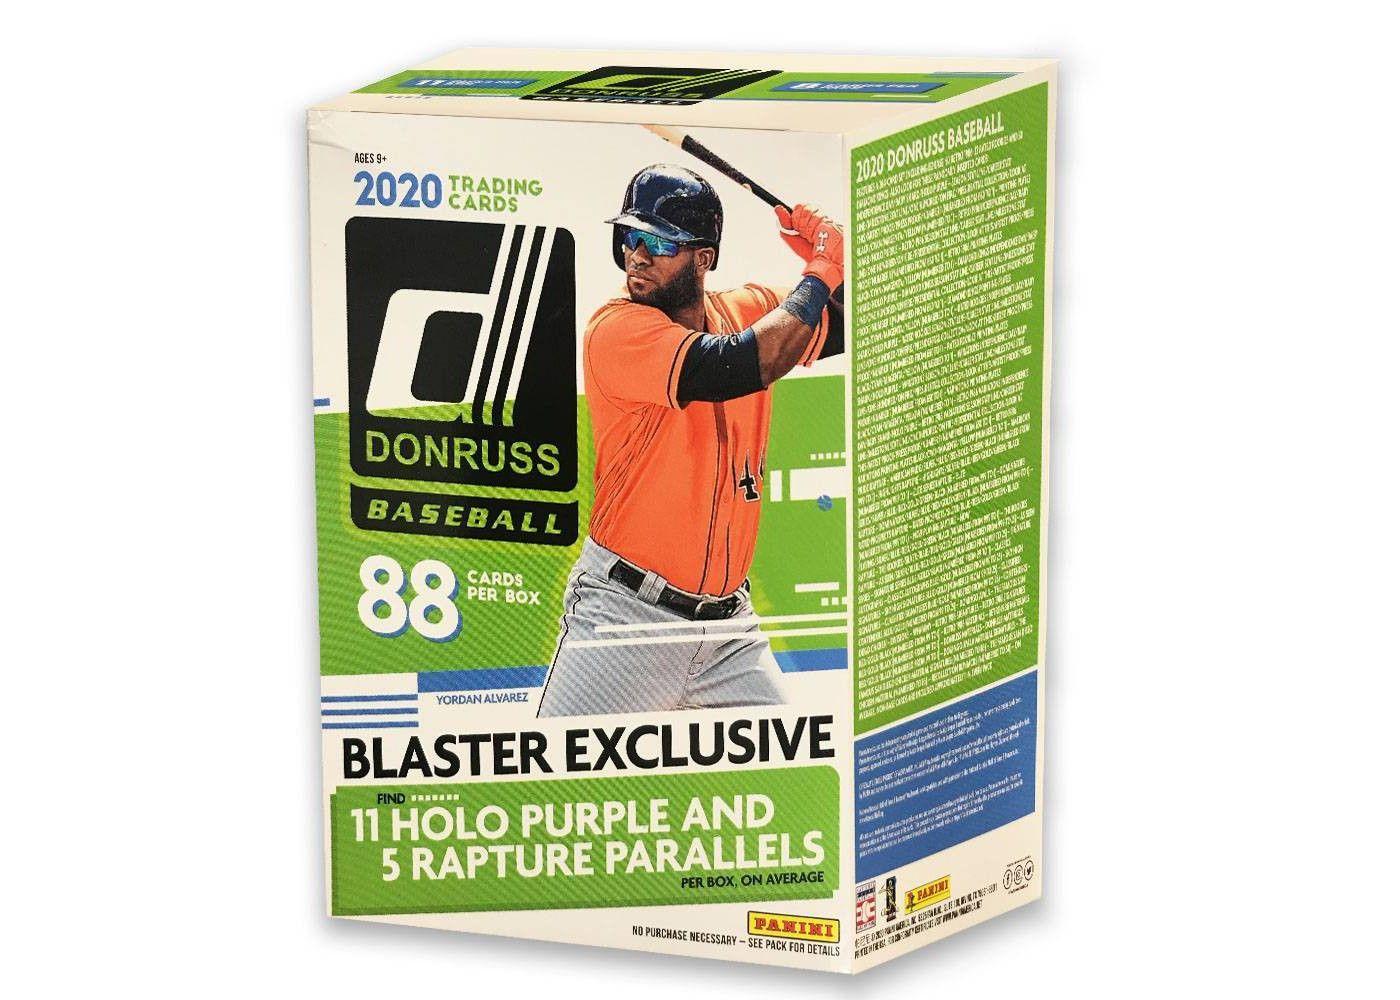 MLB 2020 Donruss Baseball Trading Card Blaster Box